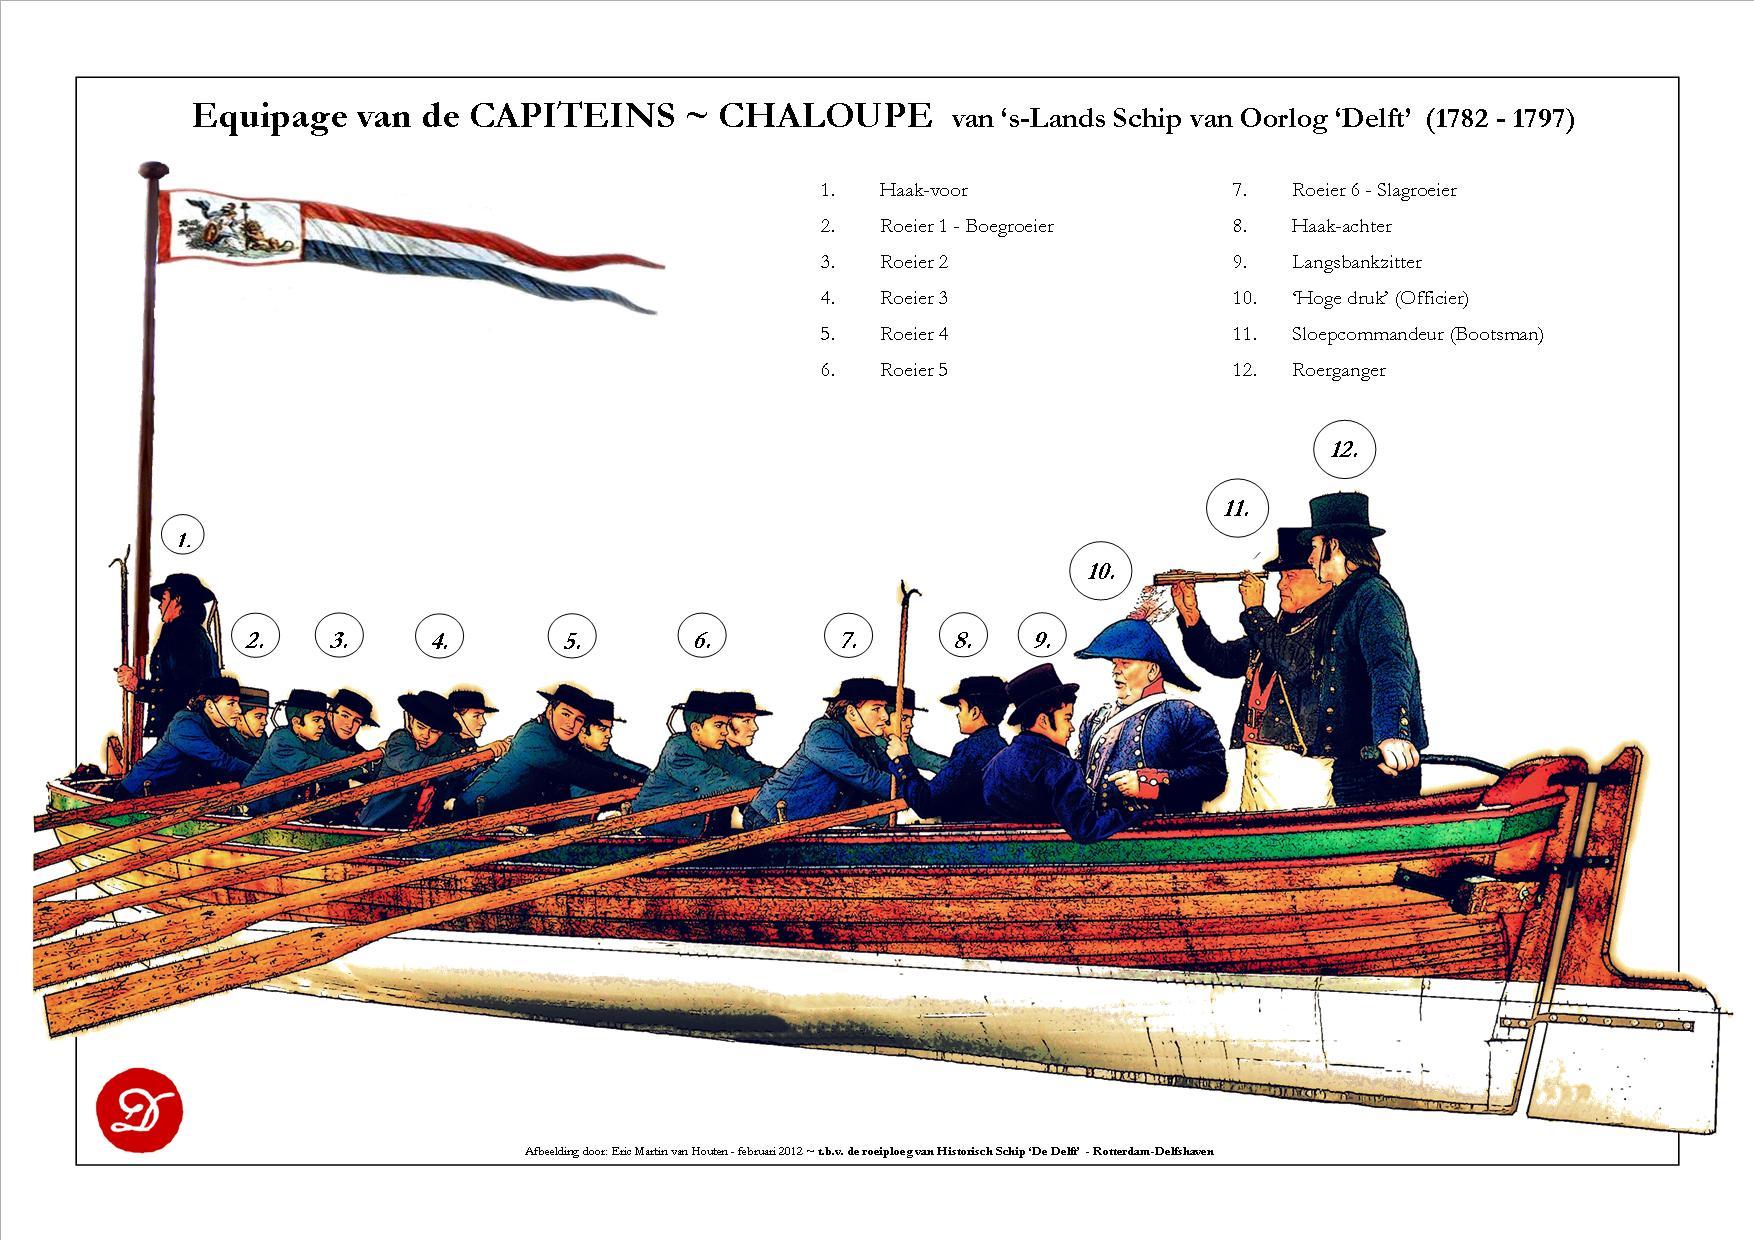 Capiteyns-Chaloupe 1782-1797 - Marine sloep - Equipage De Delft - Matrozen en Mariniers - Bataafse Republiek - roeisloep - Netherlands Navy sloop